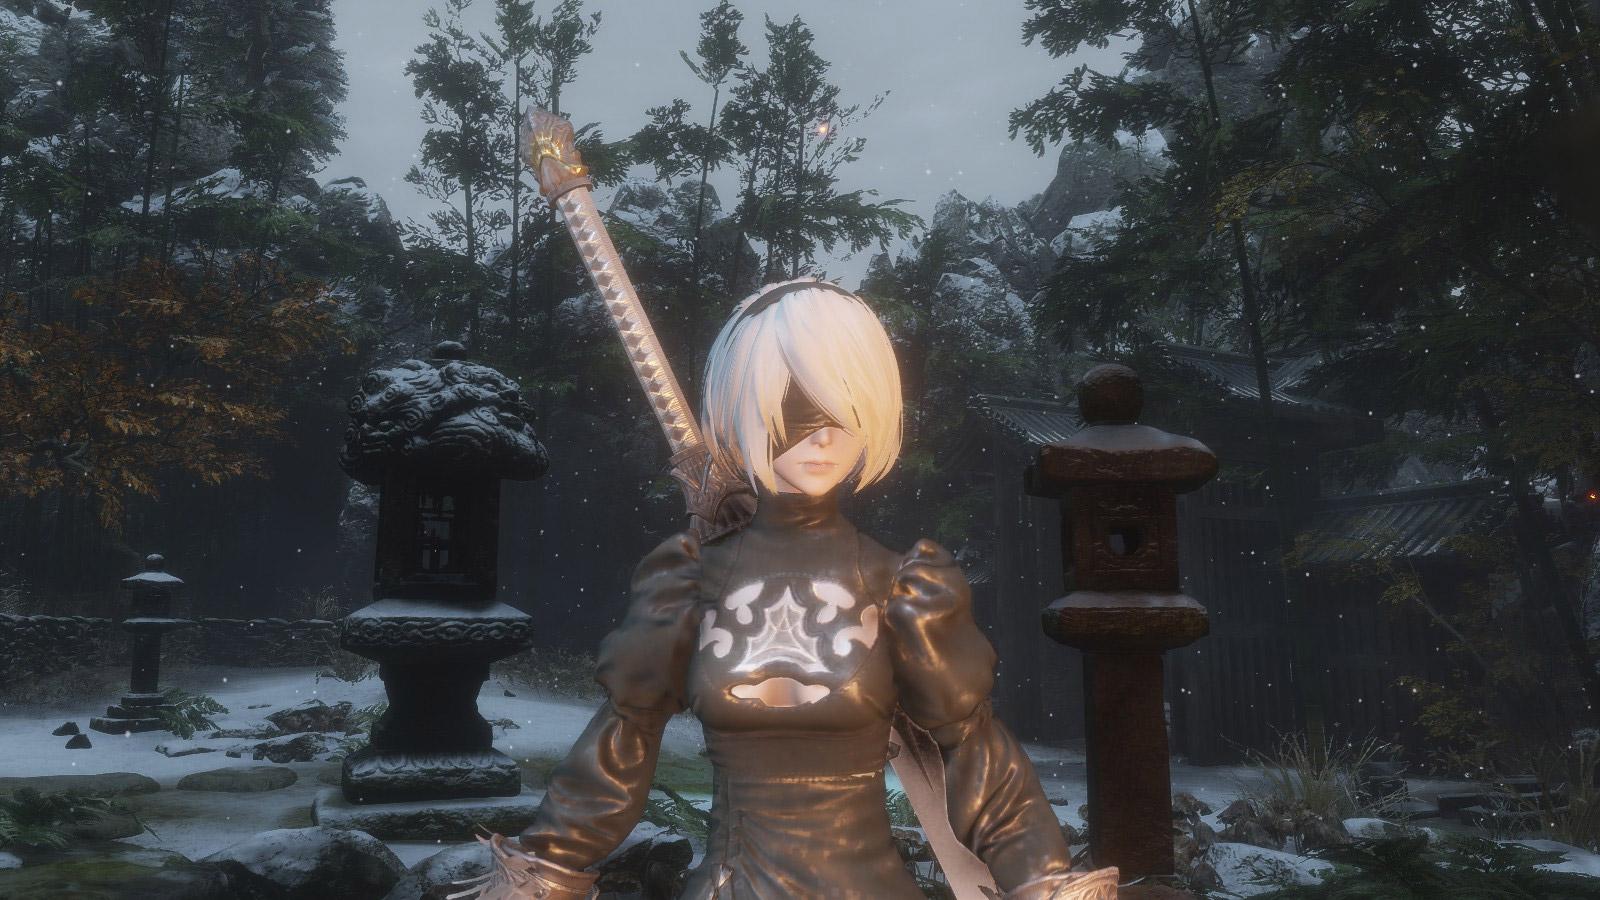 2B brings her bloodlust to Ashina with this Sekiro mod screenshot